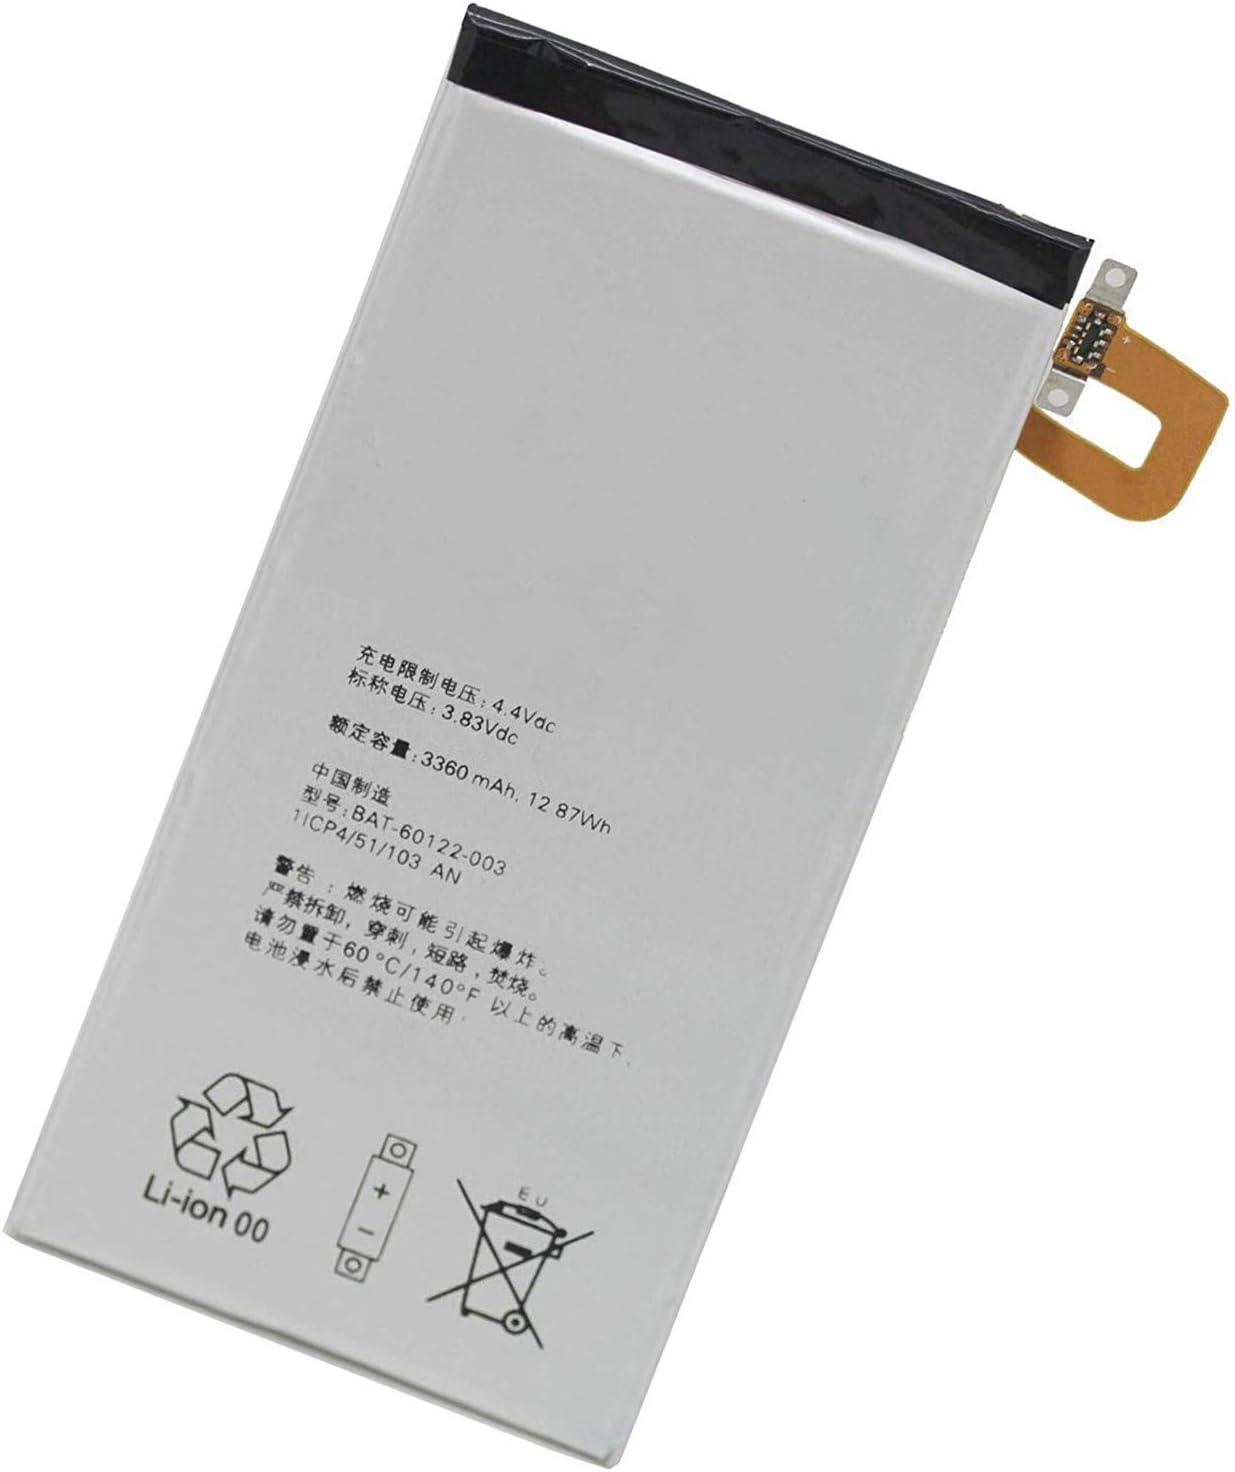 Uniamy Replacement Battery For BlackBerry PRIV STV-100 BAT-60122-003 3.83V 3360mAh